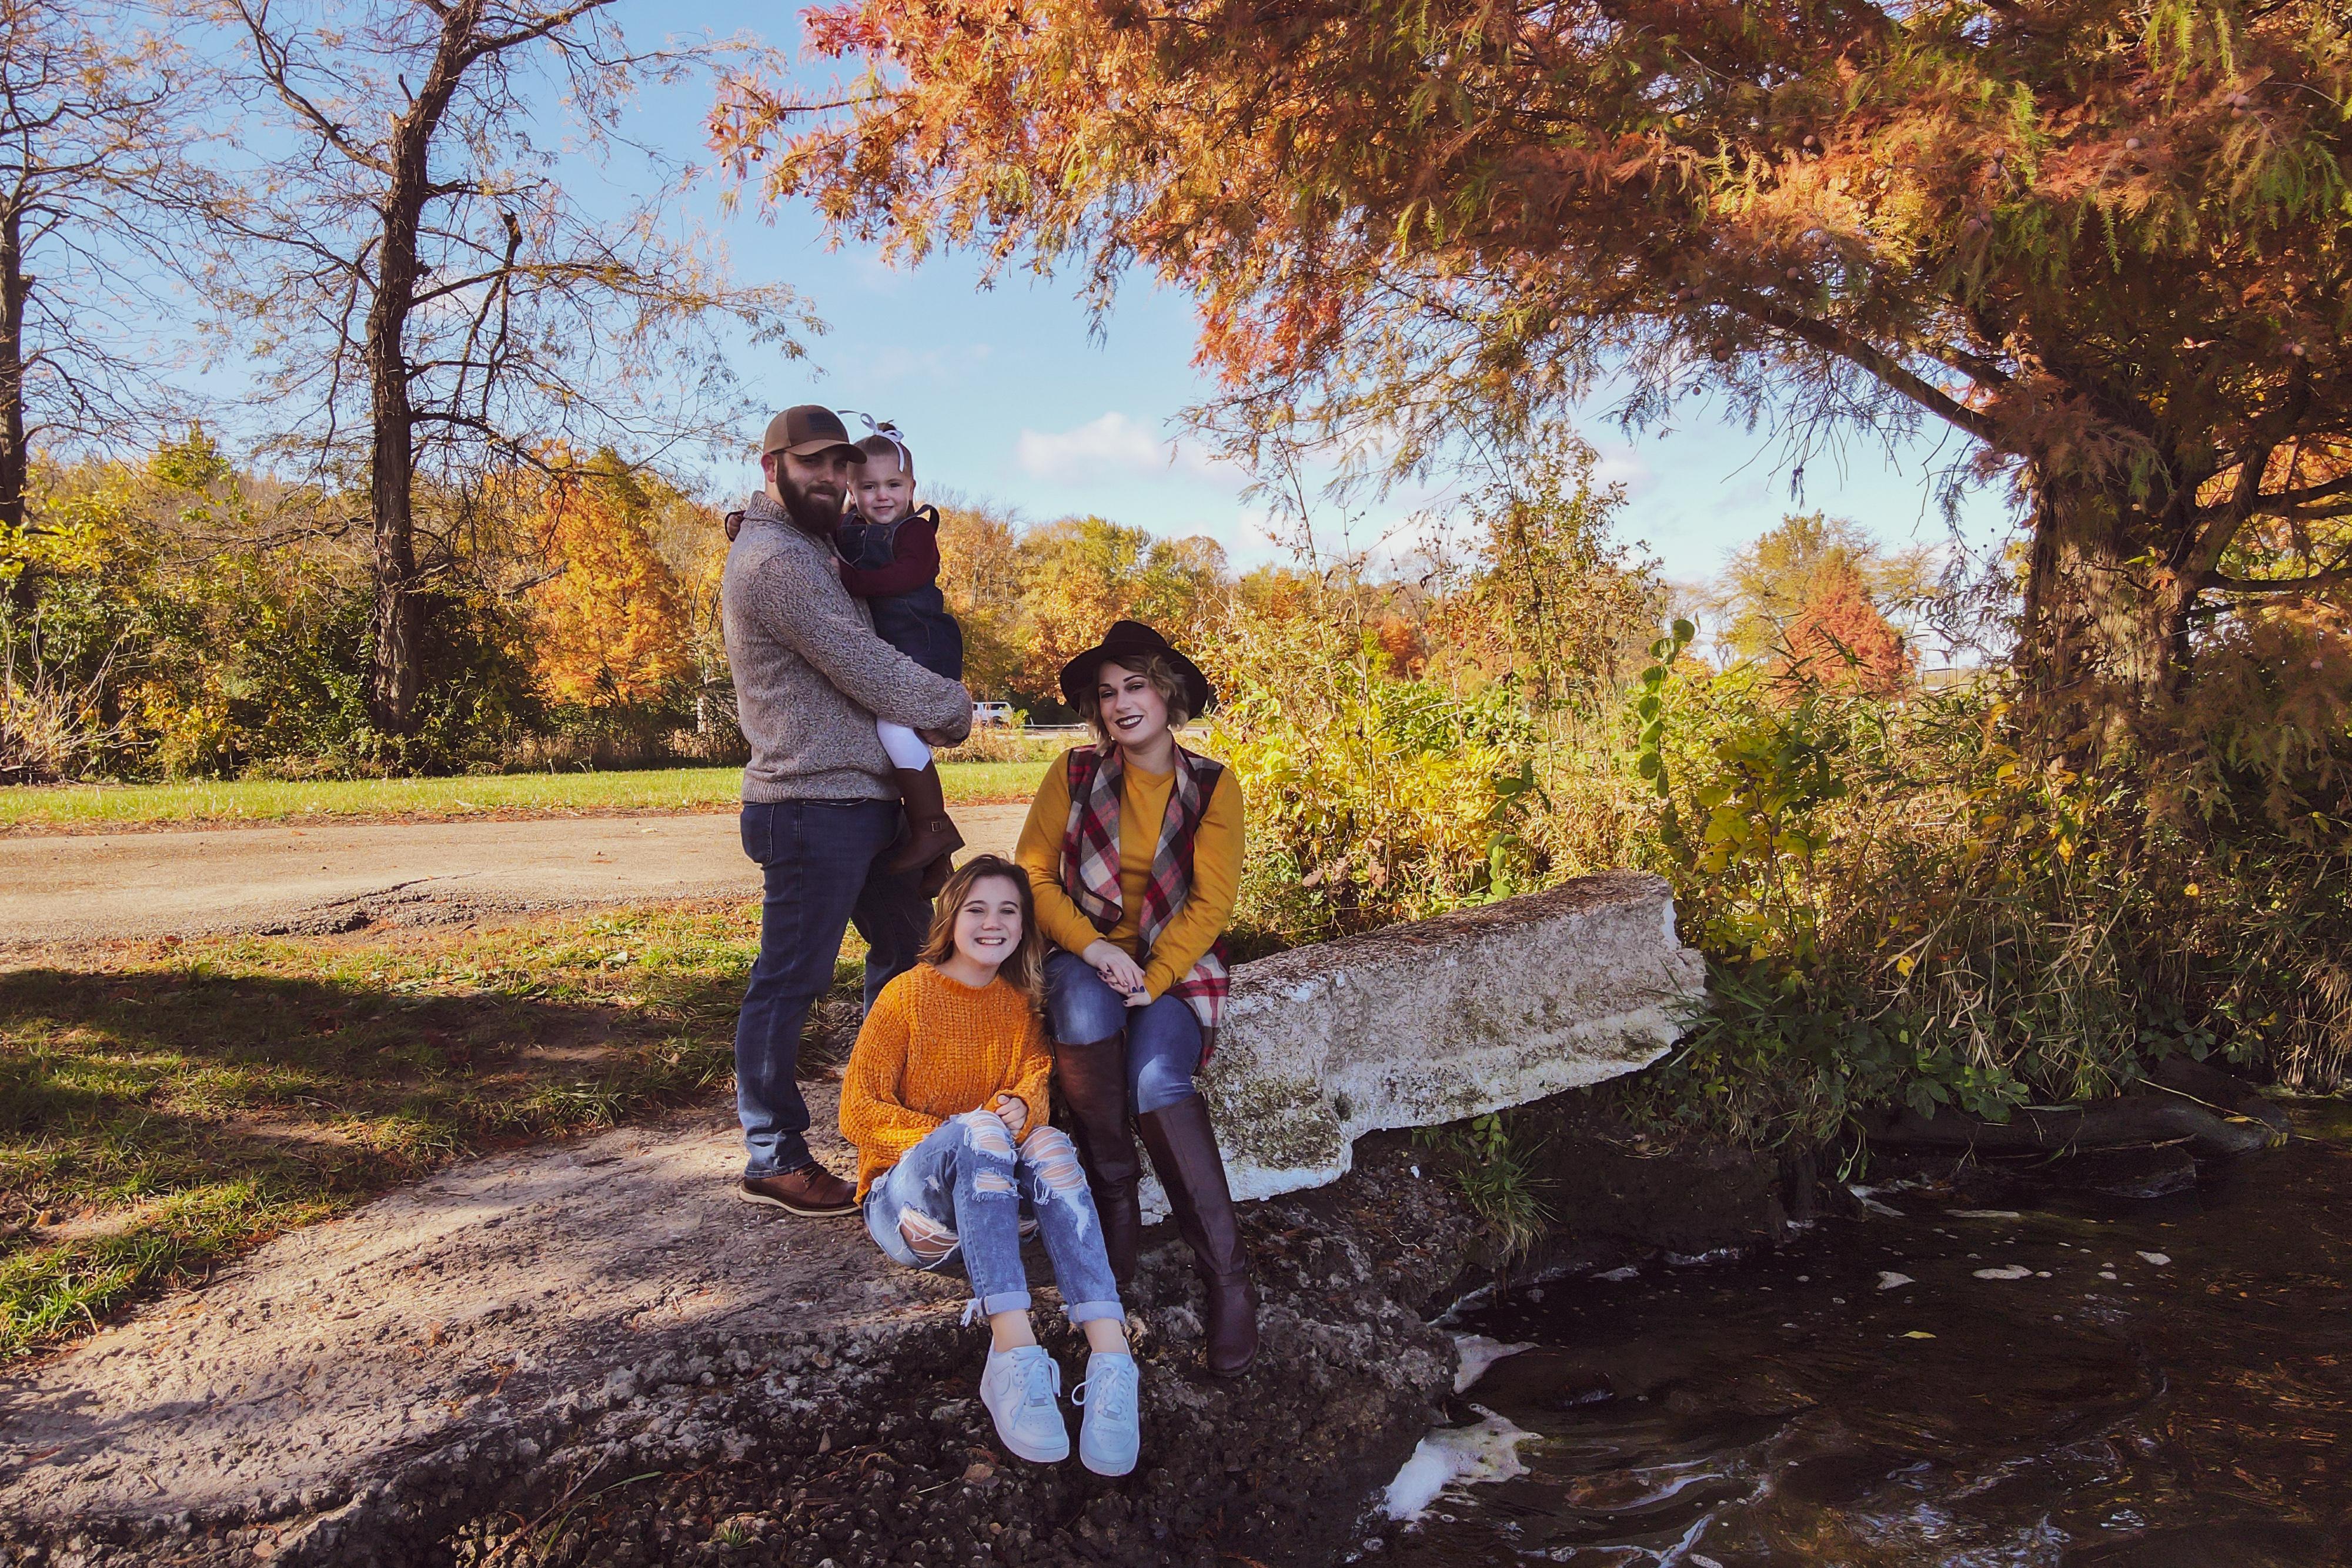 Stephanie_Kay_Fall_Family_LRE-18